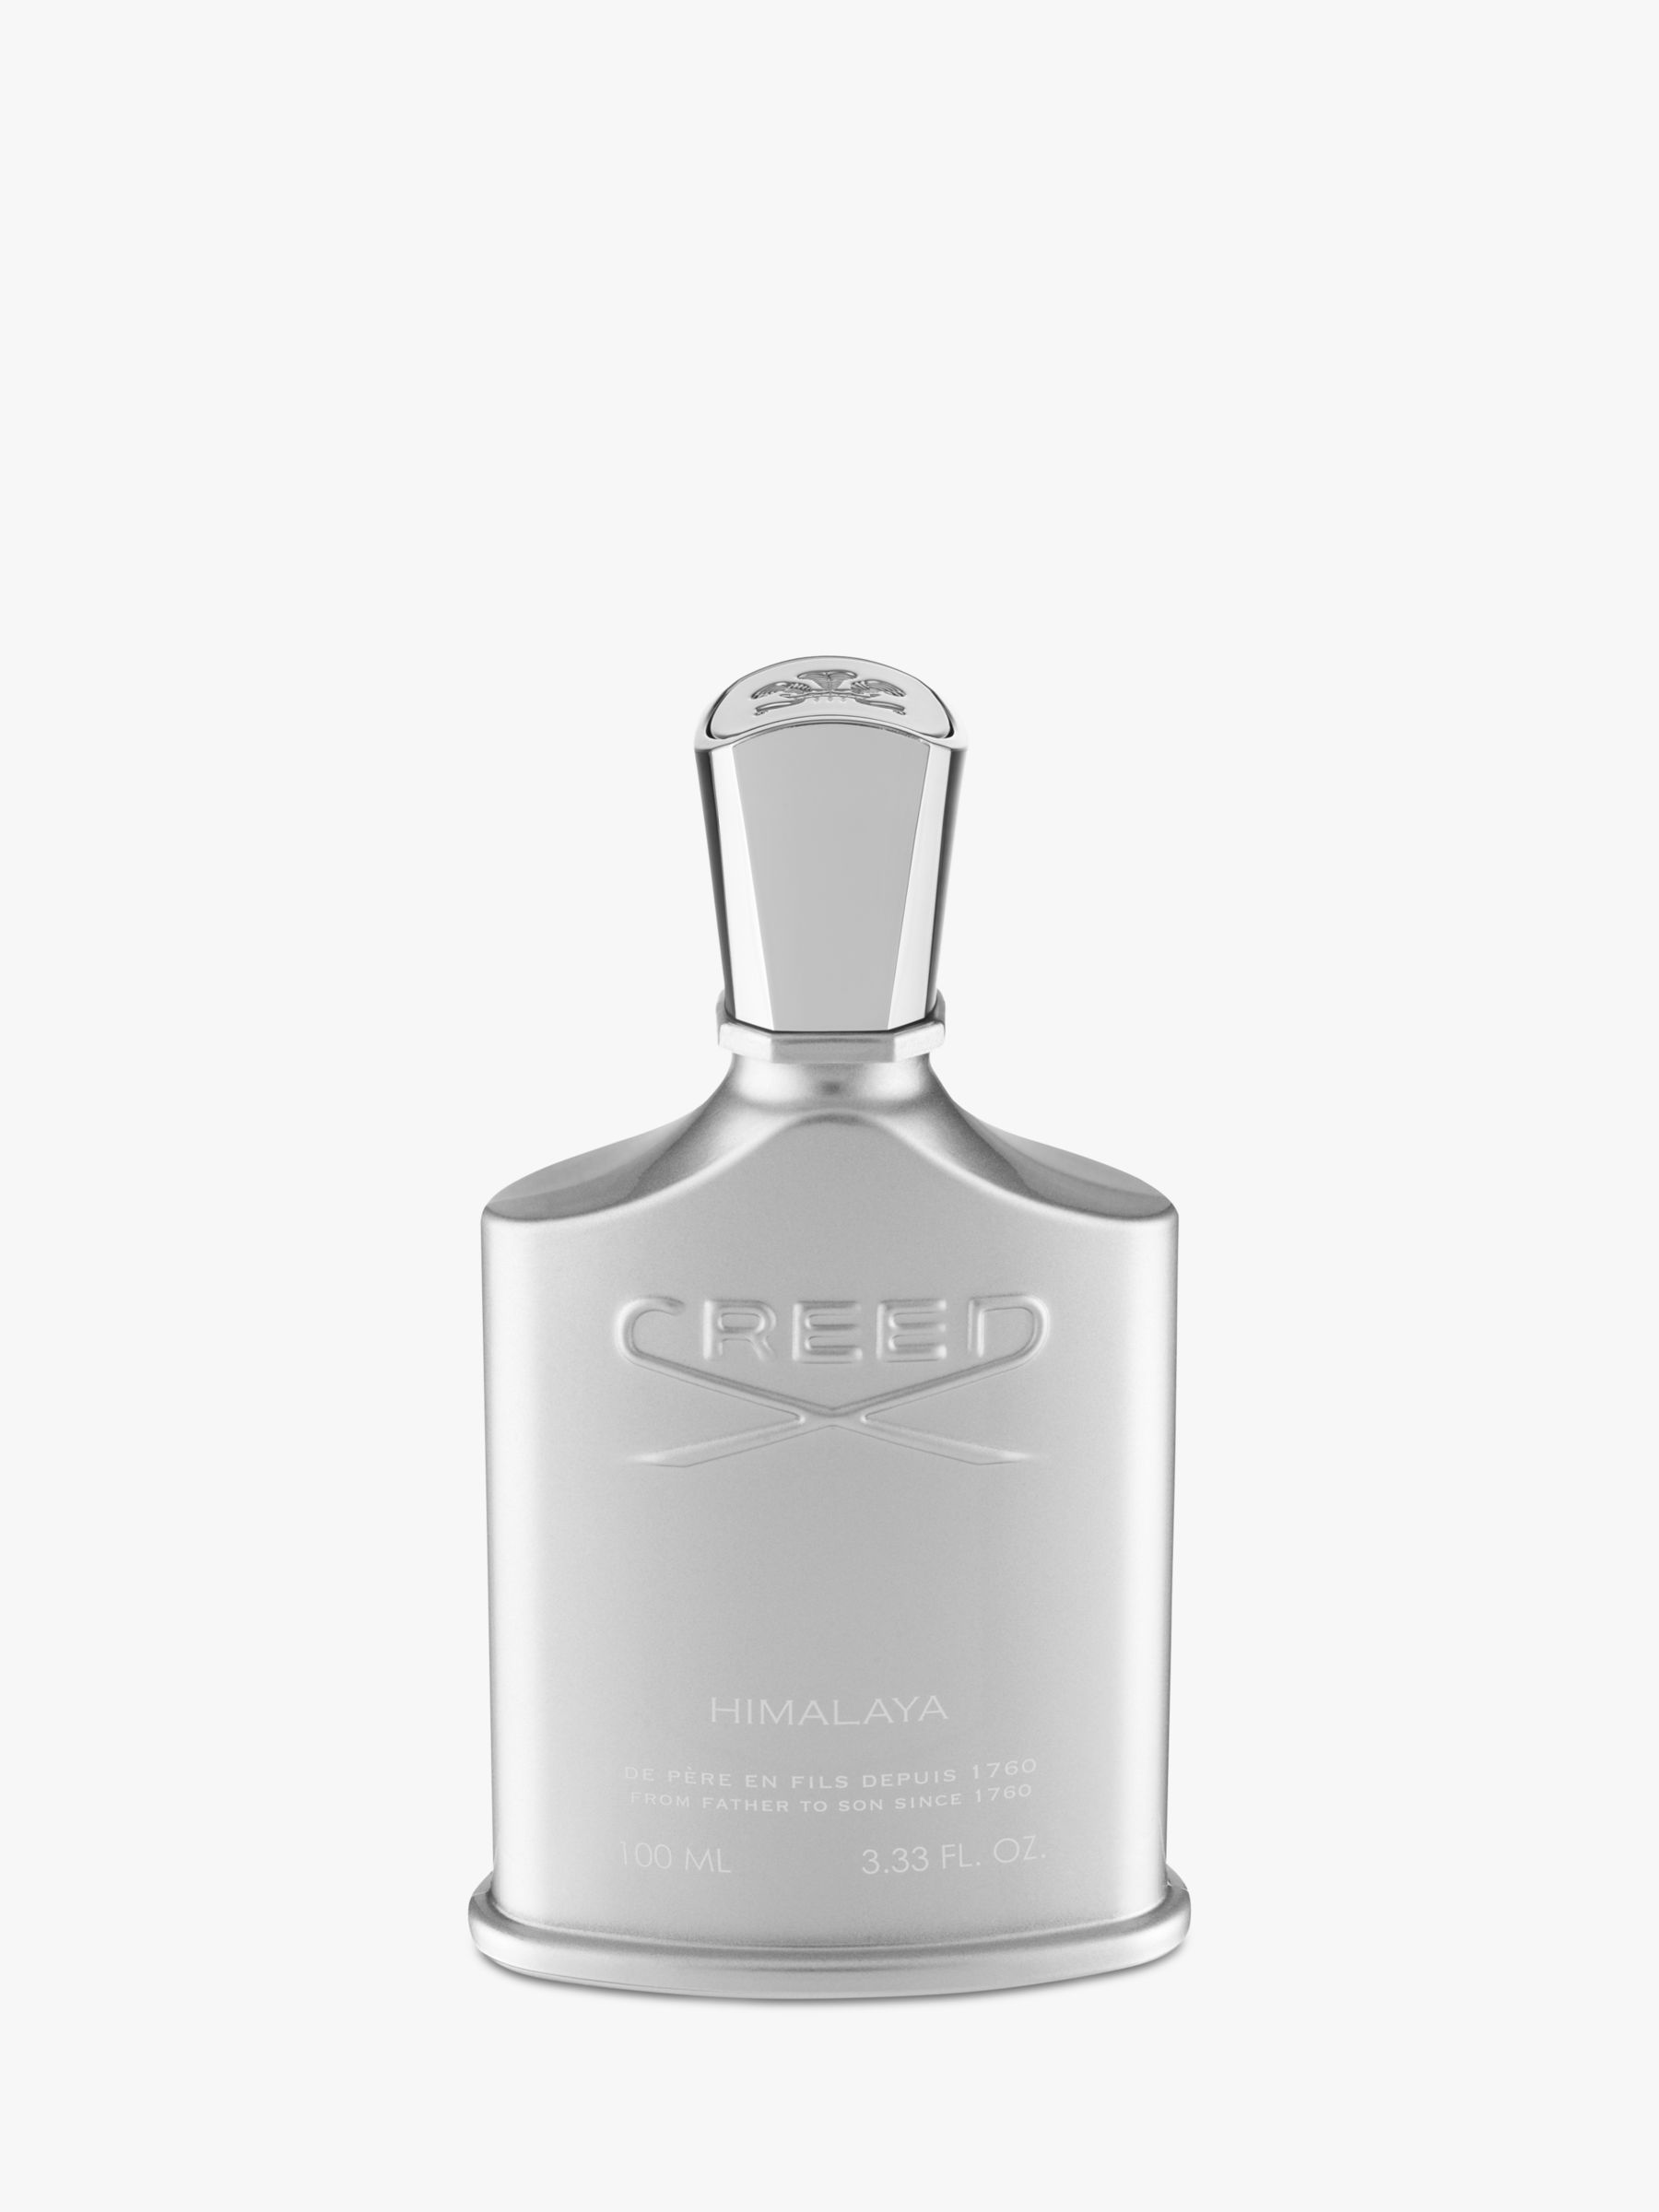 Creed CREED Himalaya Eau de Parfum, 100ml